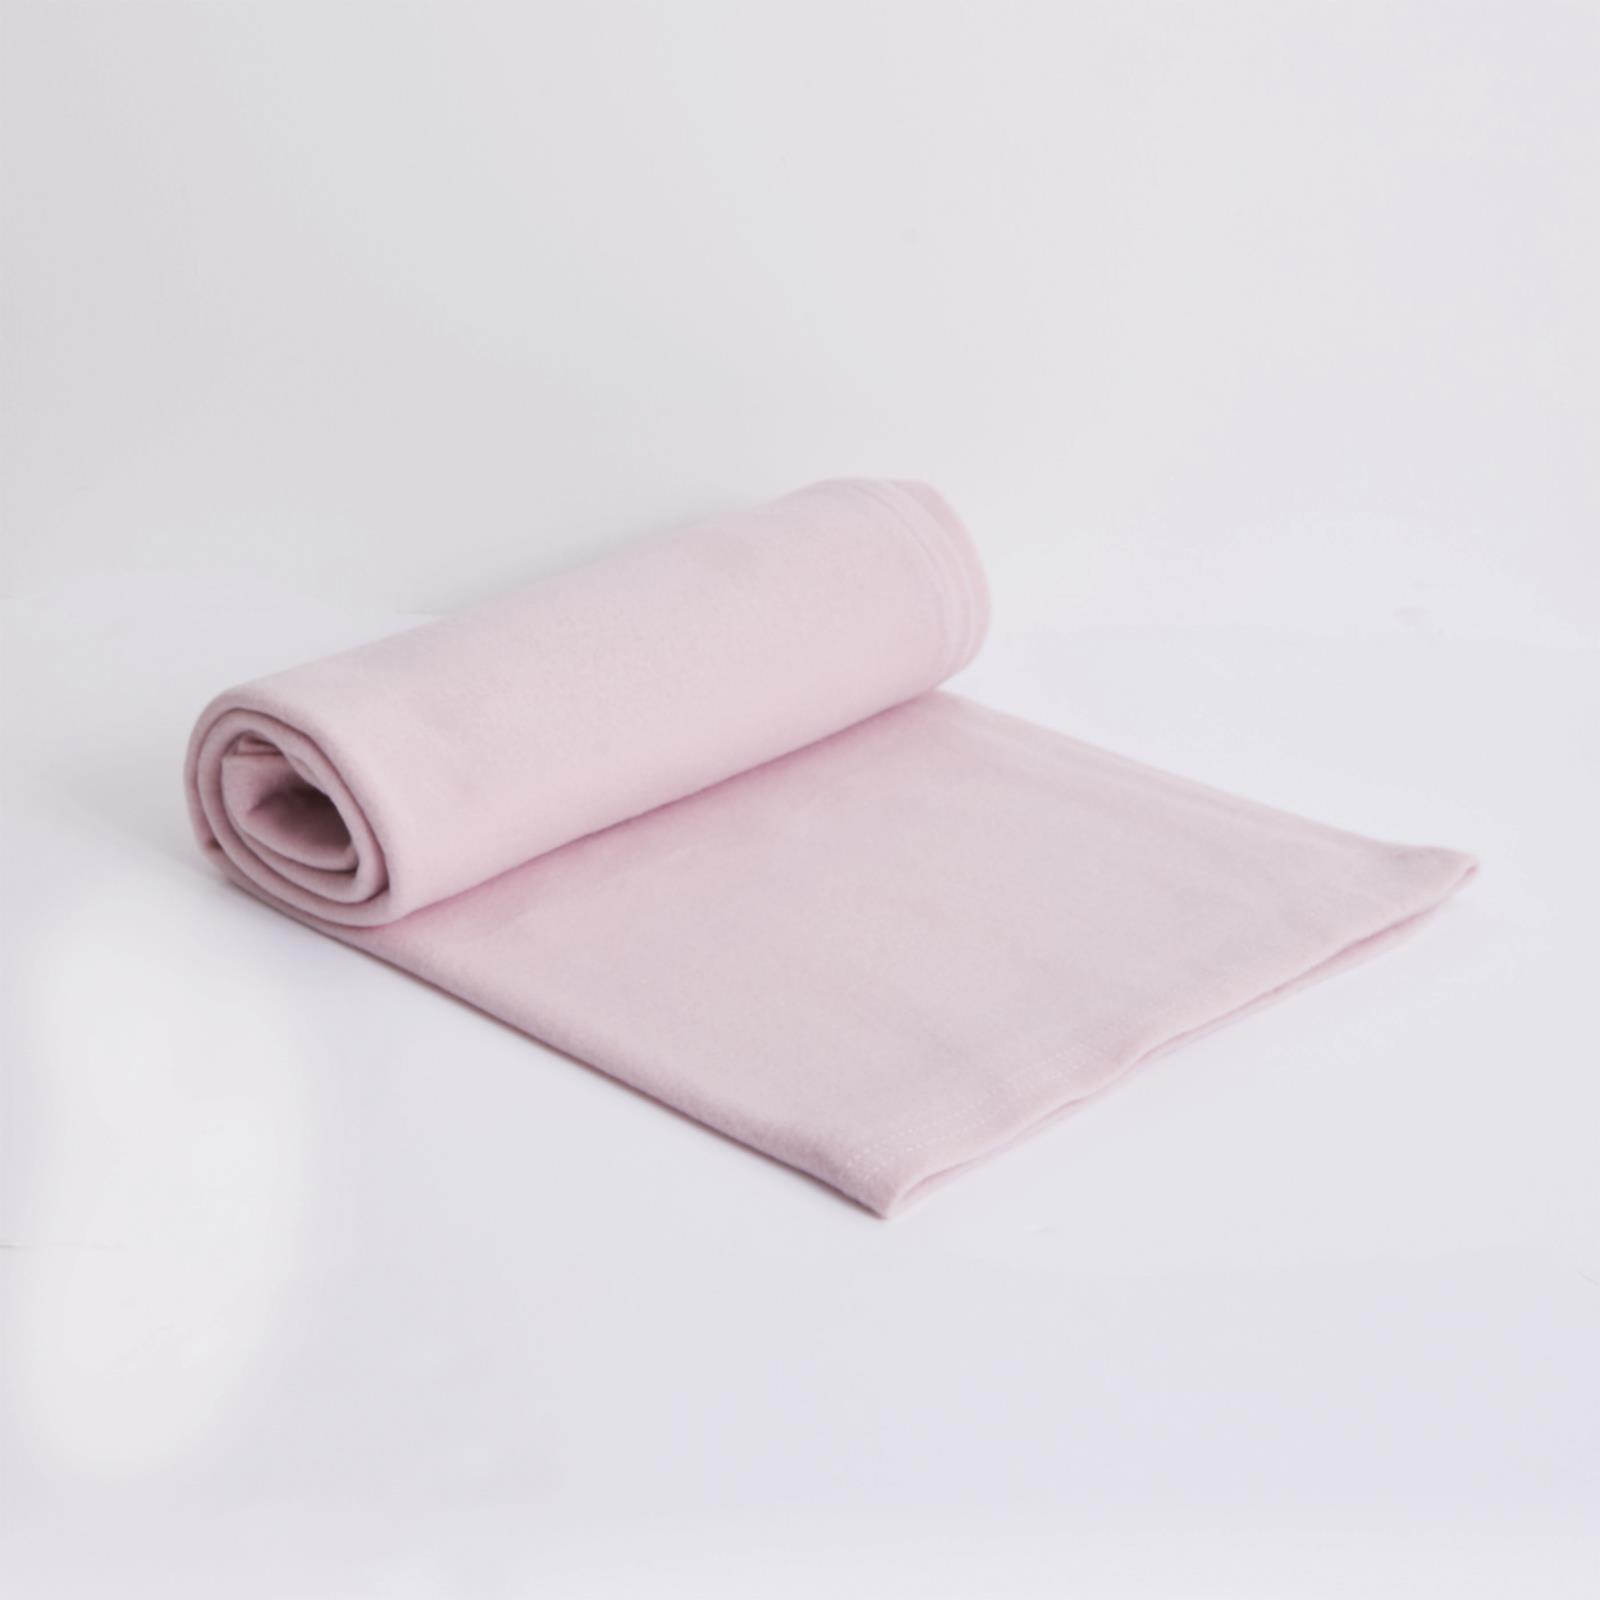 thumbnail 4 - Wholesale 10 x Plain Fleece Blanket Bulk Warm Sofa Throw Over 120 x 150cm Joblot